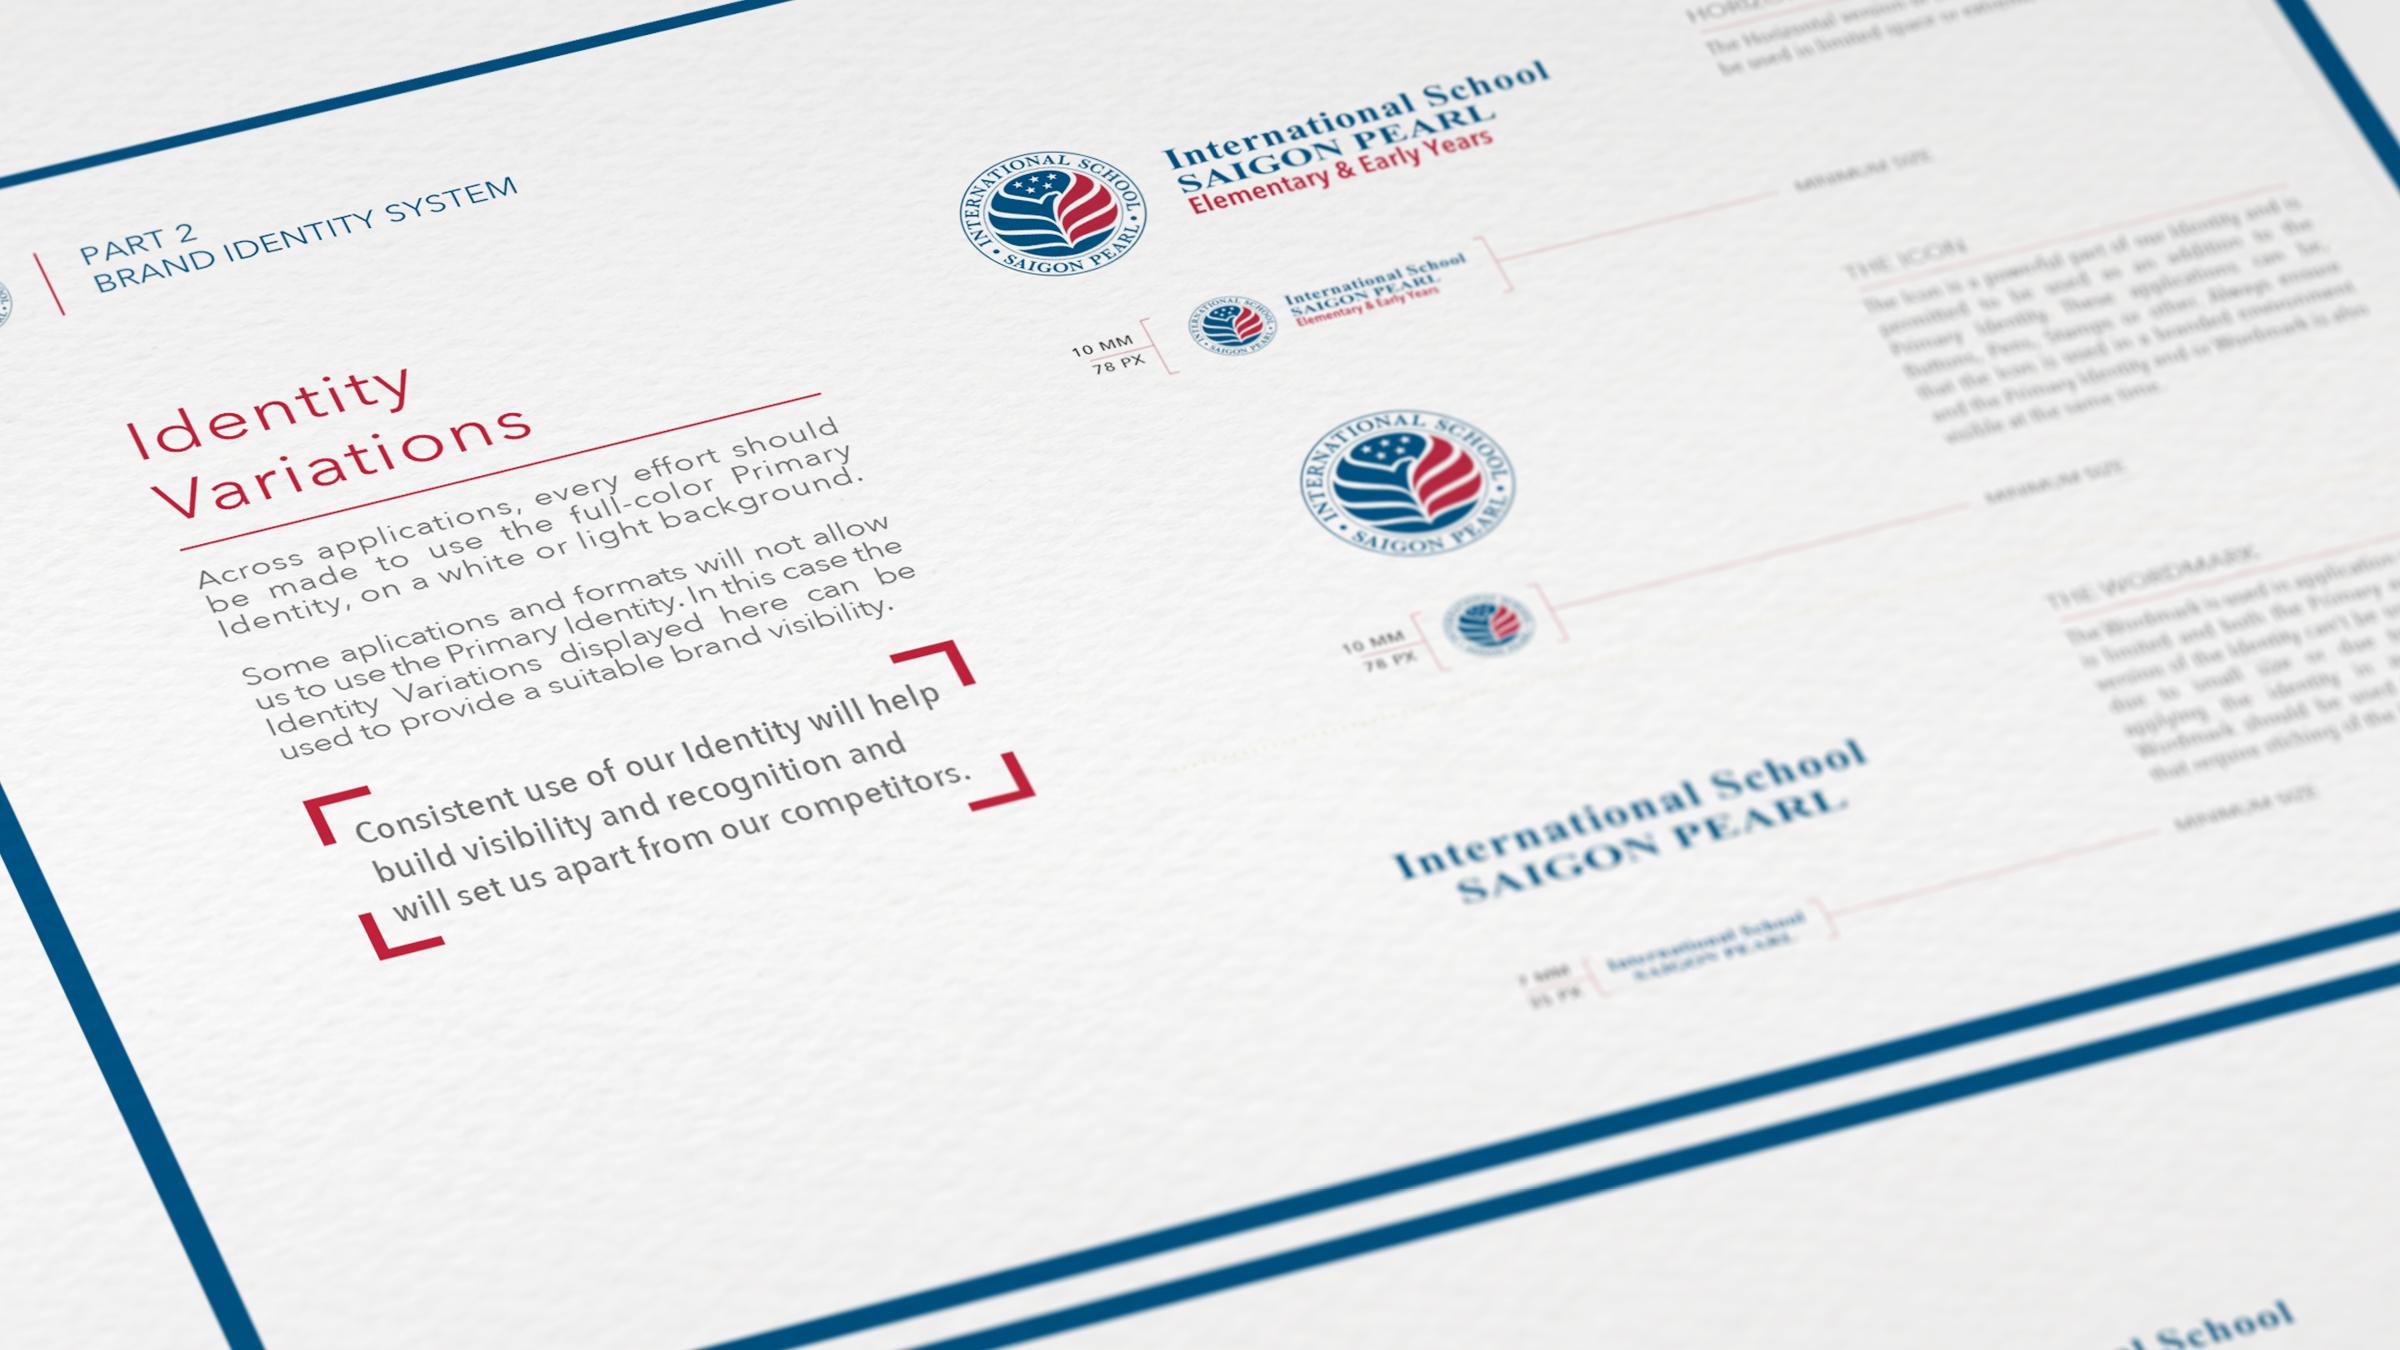 The Circle Branding Partners ISSP International School Brand Consulting